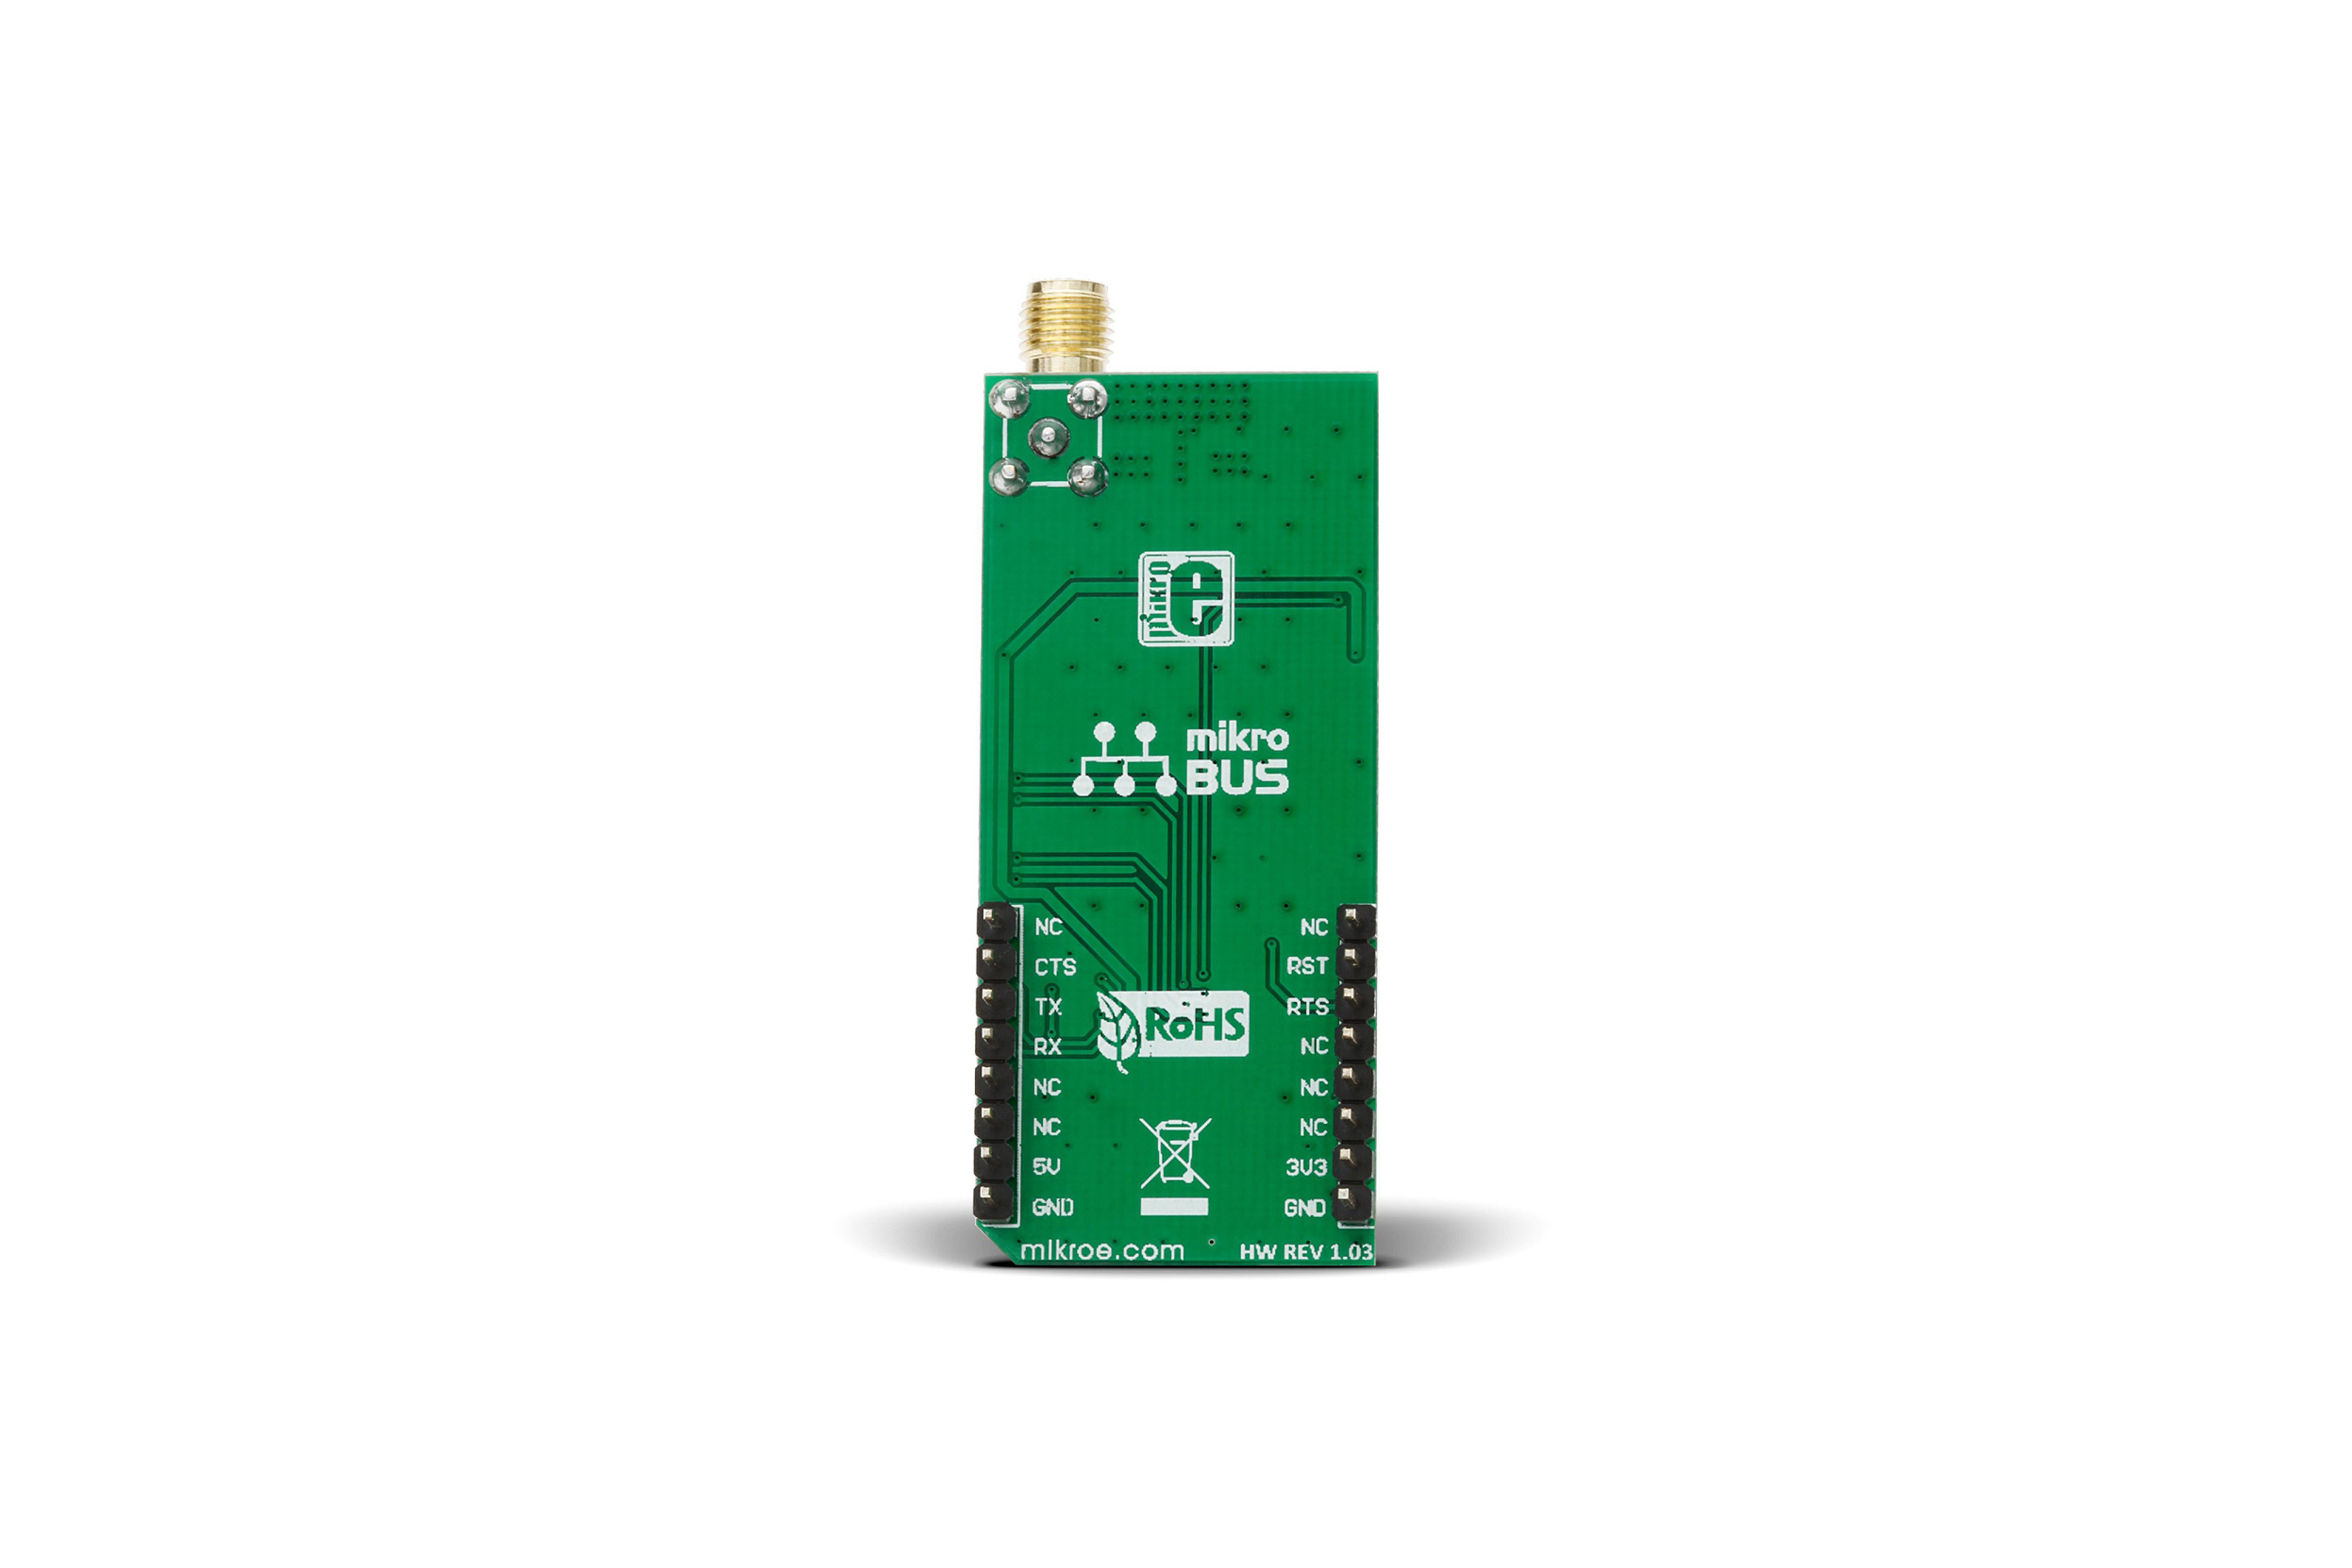 MikroElektronika LoRa 2 mikroBUS Click Board voor RN2903